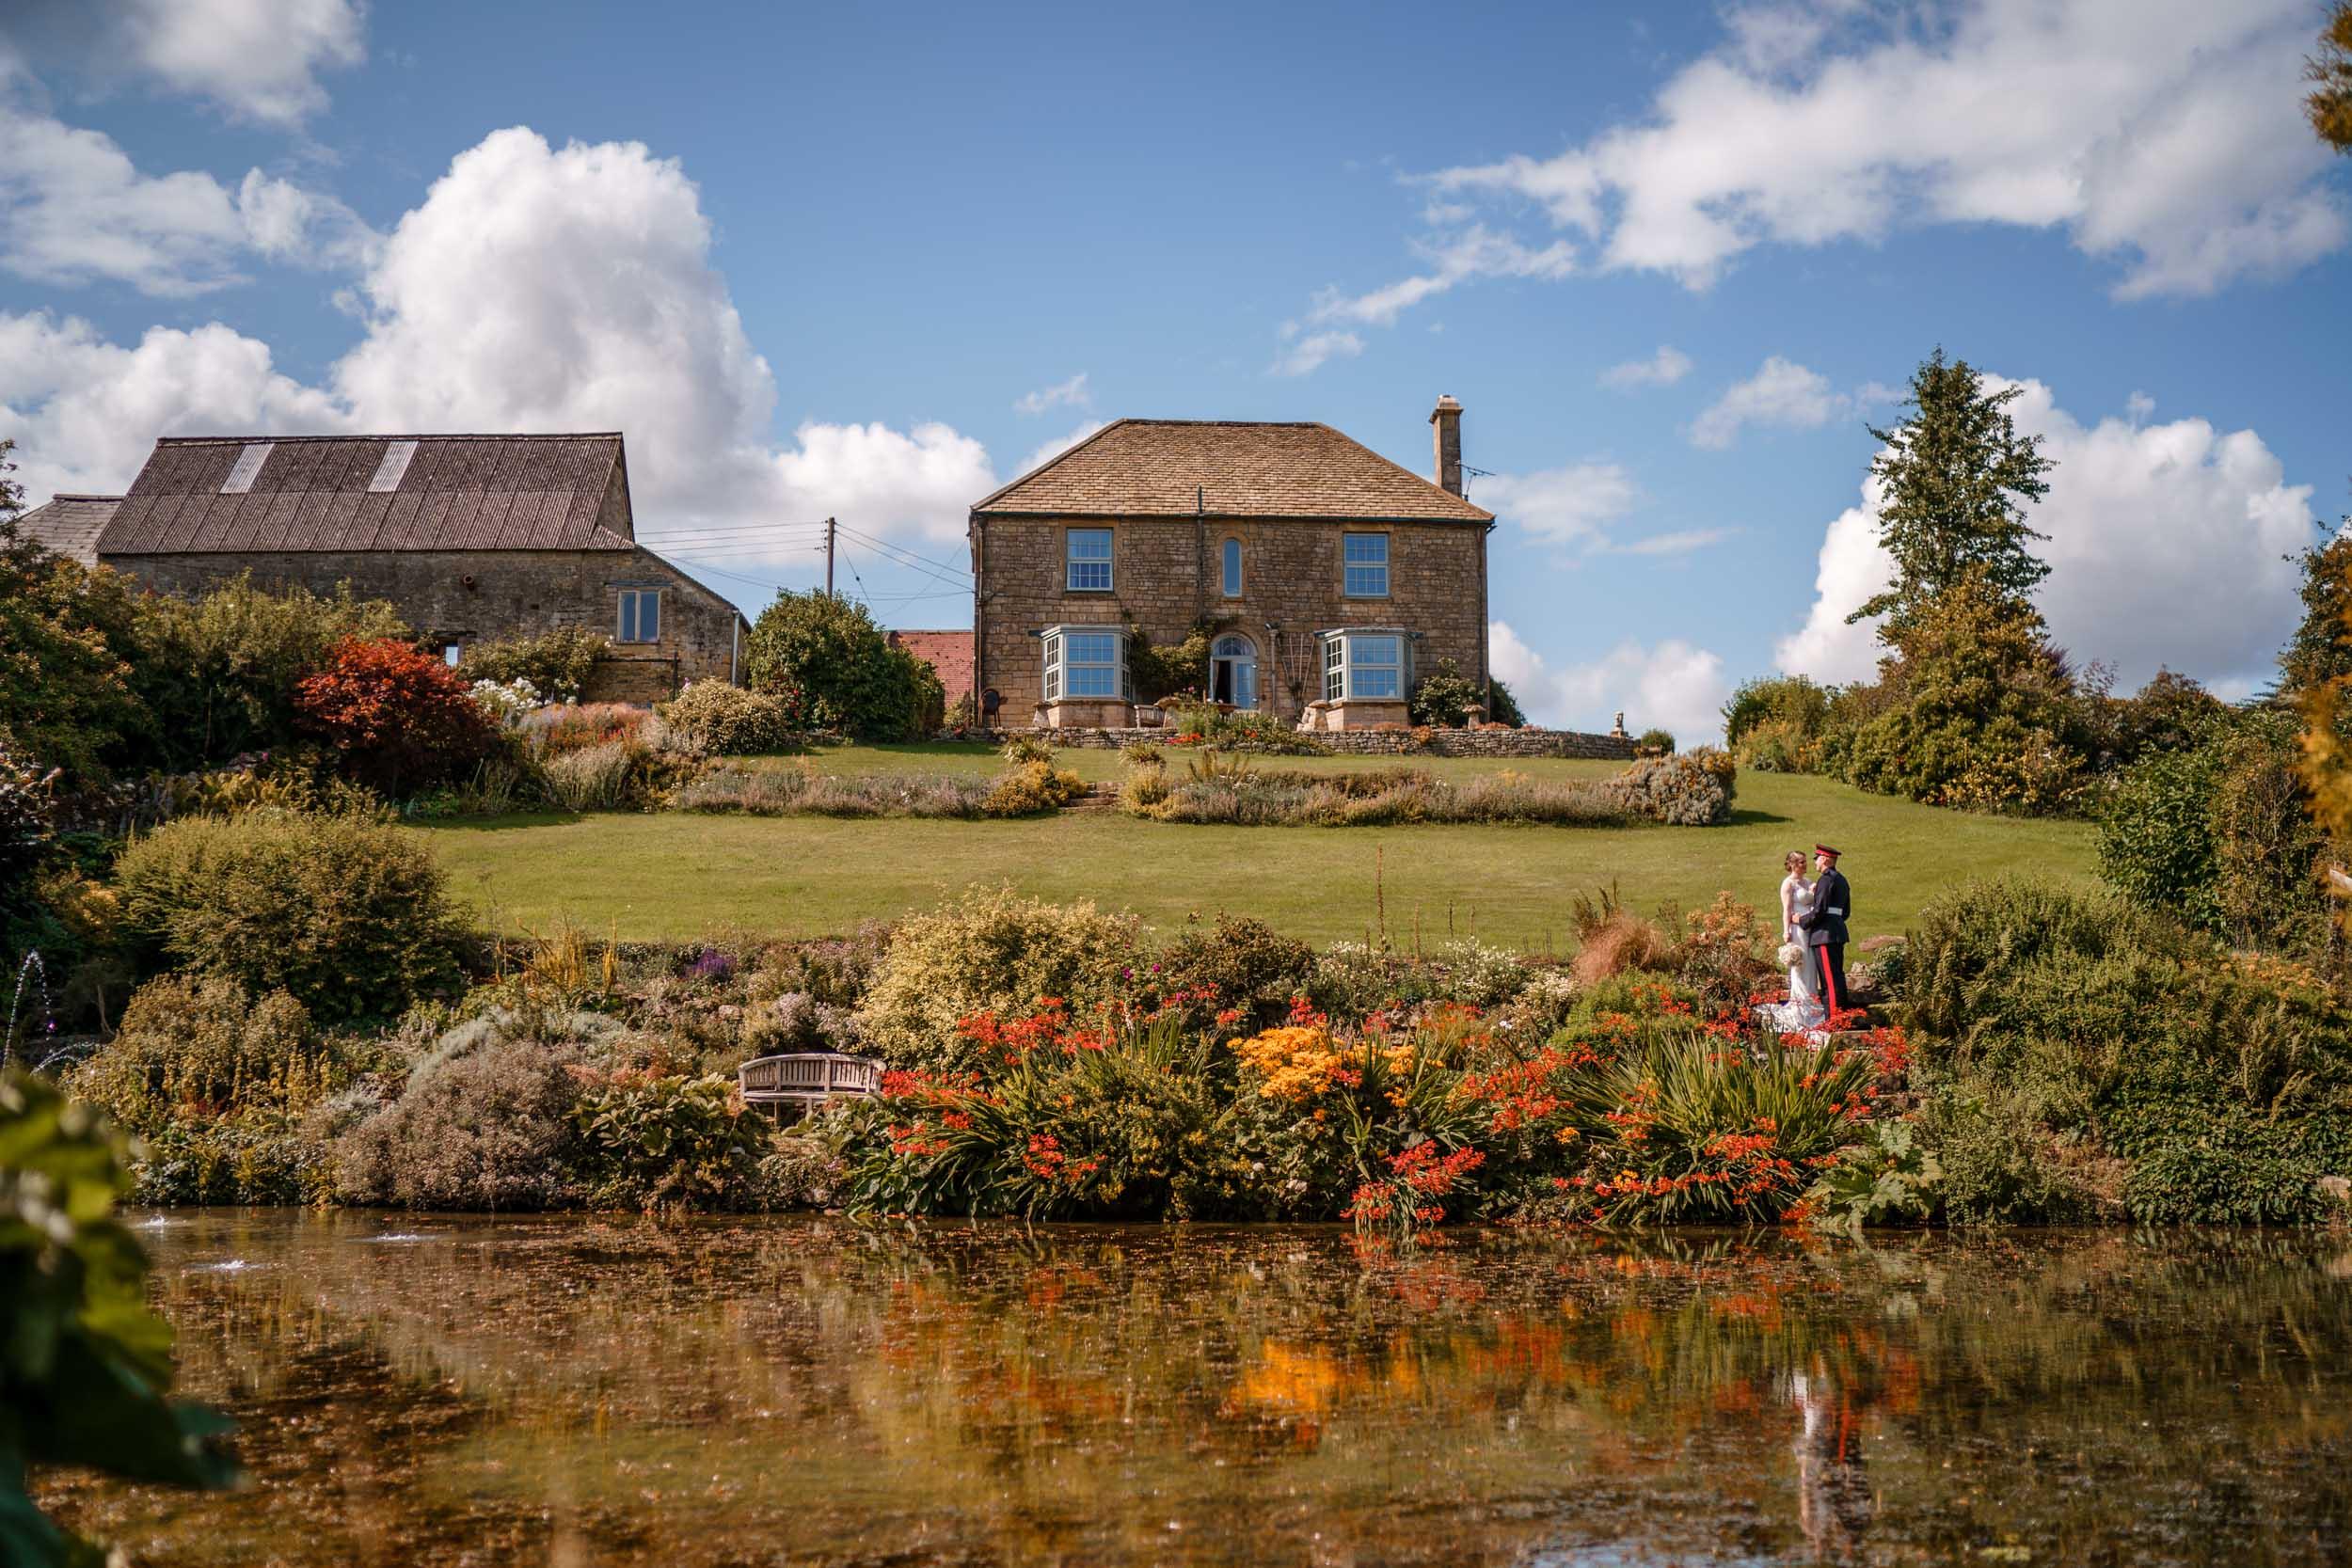 The Barn at Upcote Wedding Photographer, Wedding Photographer Upcote Barn, The Barn at Upcote, Cotswolds Wedding Photographer, Upcote Barn, Wedding, Photography, Gloucestershire Wedding Photographer